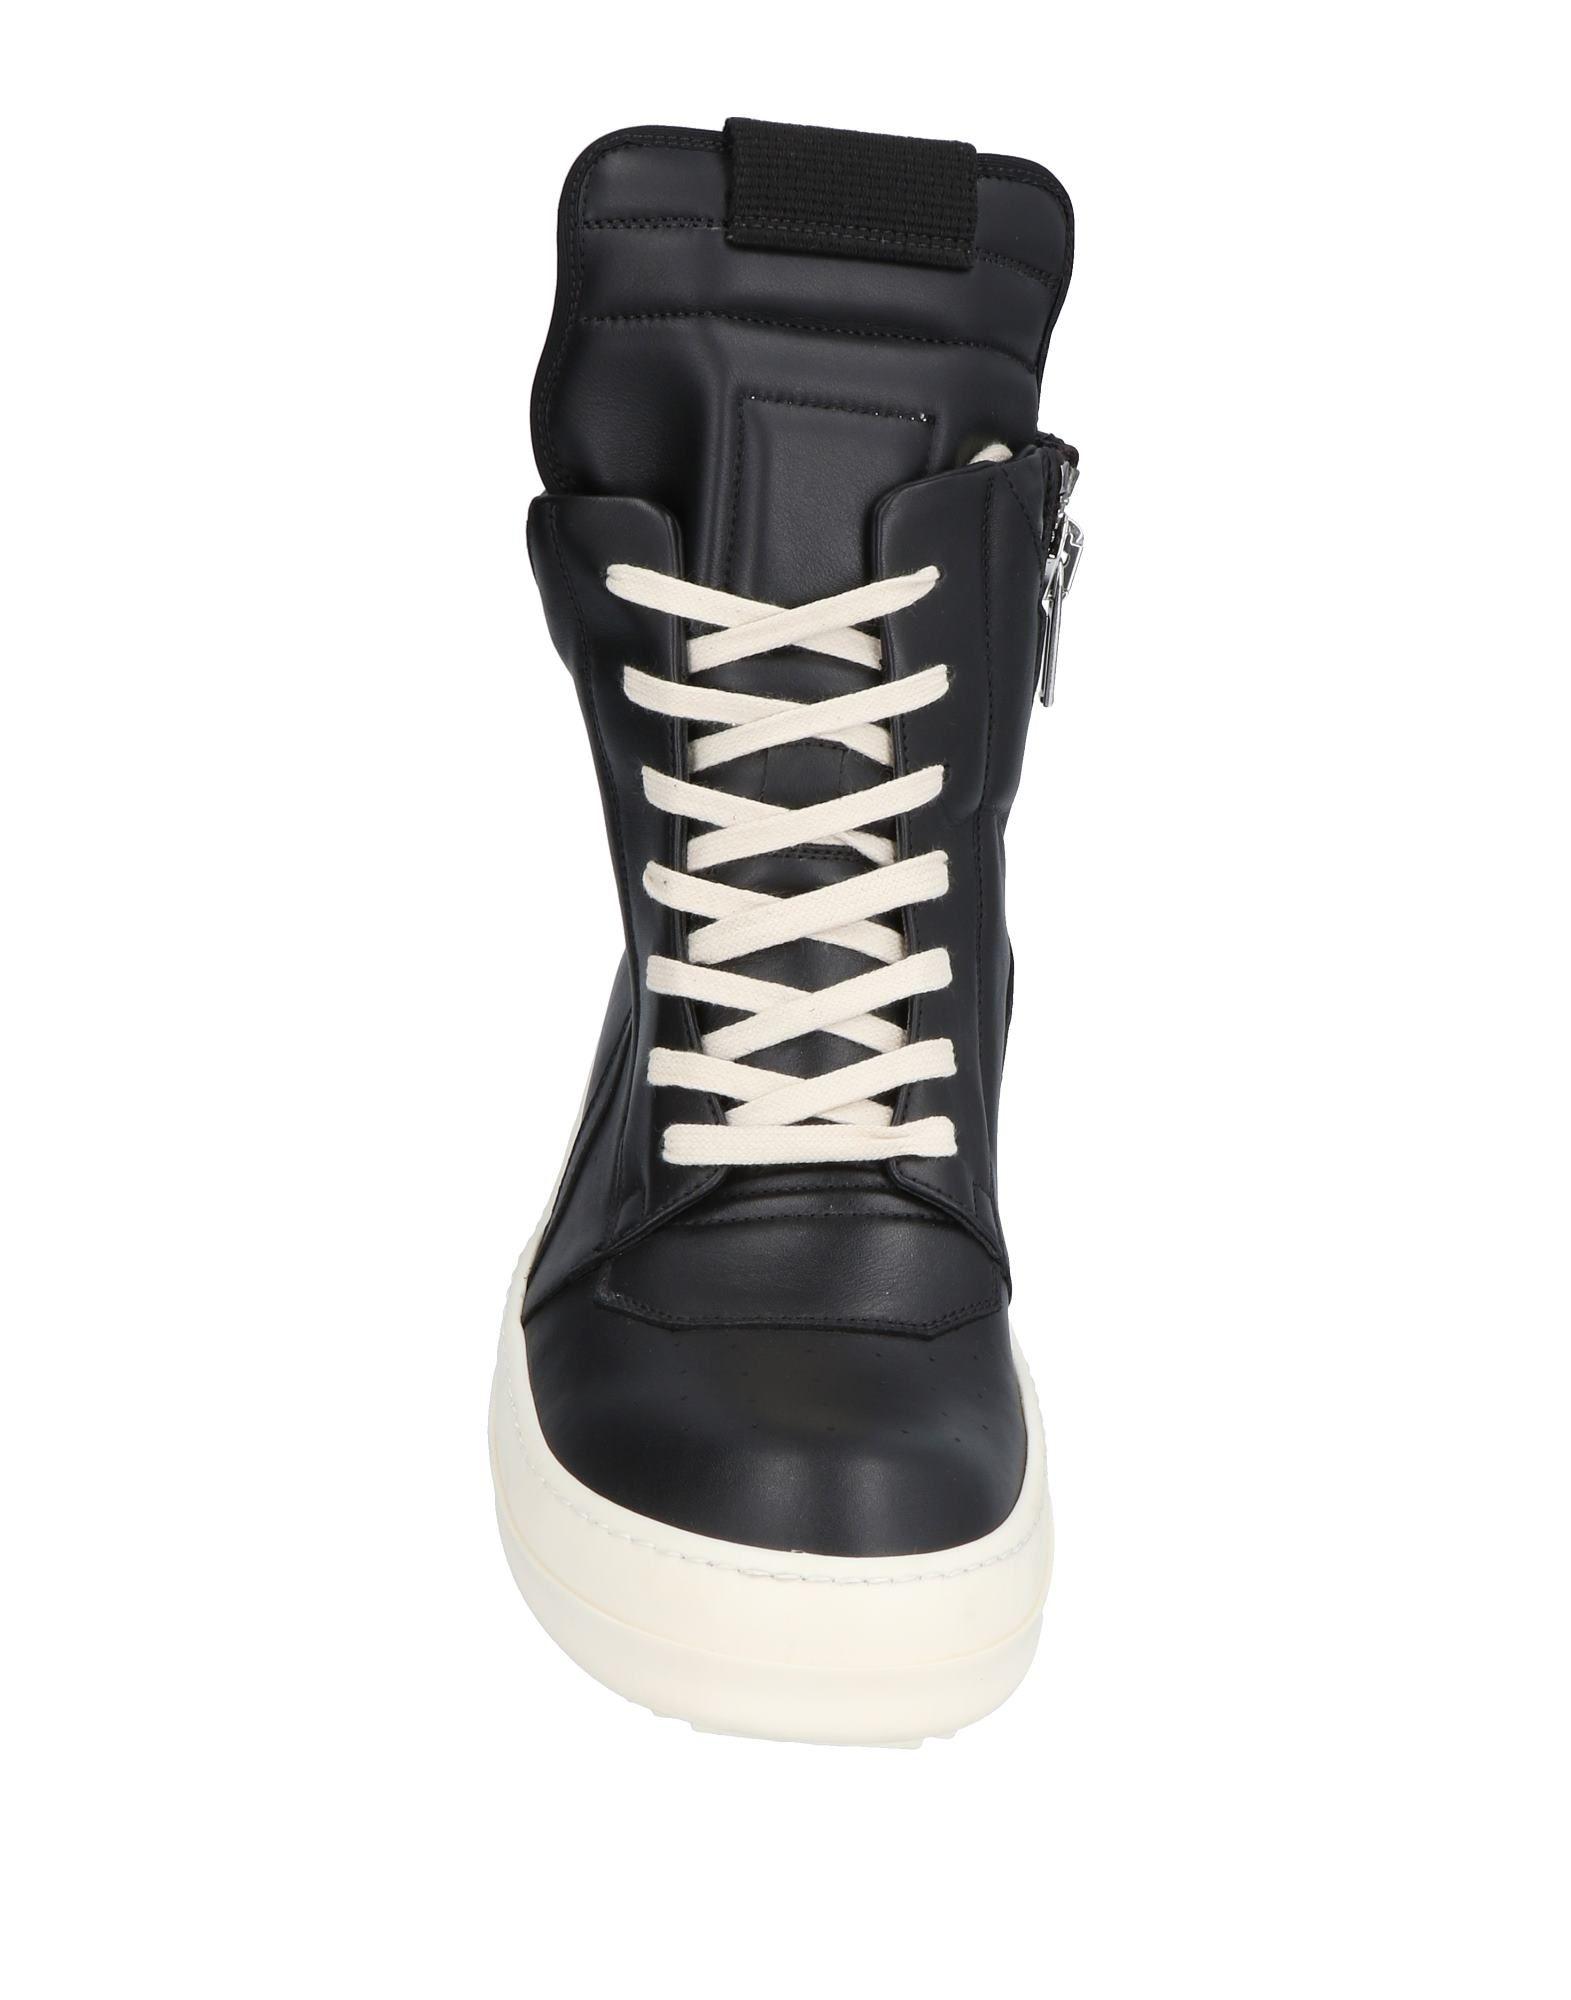 Rick Owens Sneakers Herren  11488735NL Gute Qualität beliebte Schuhe